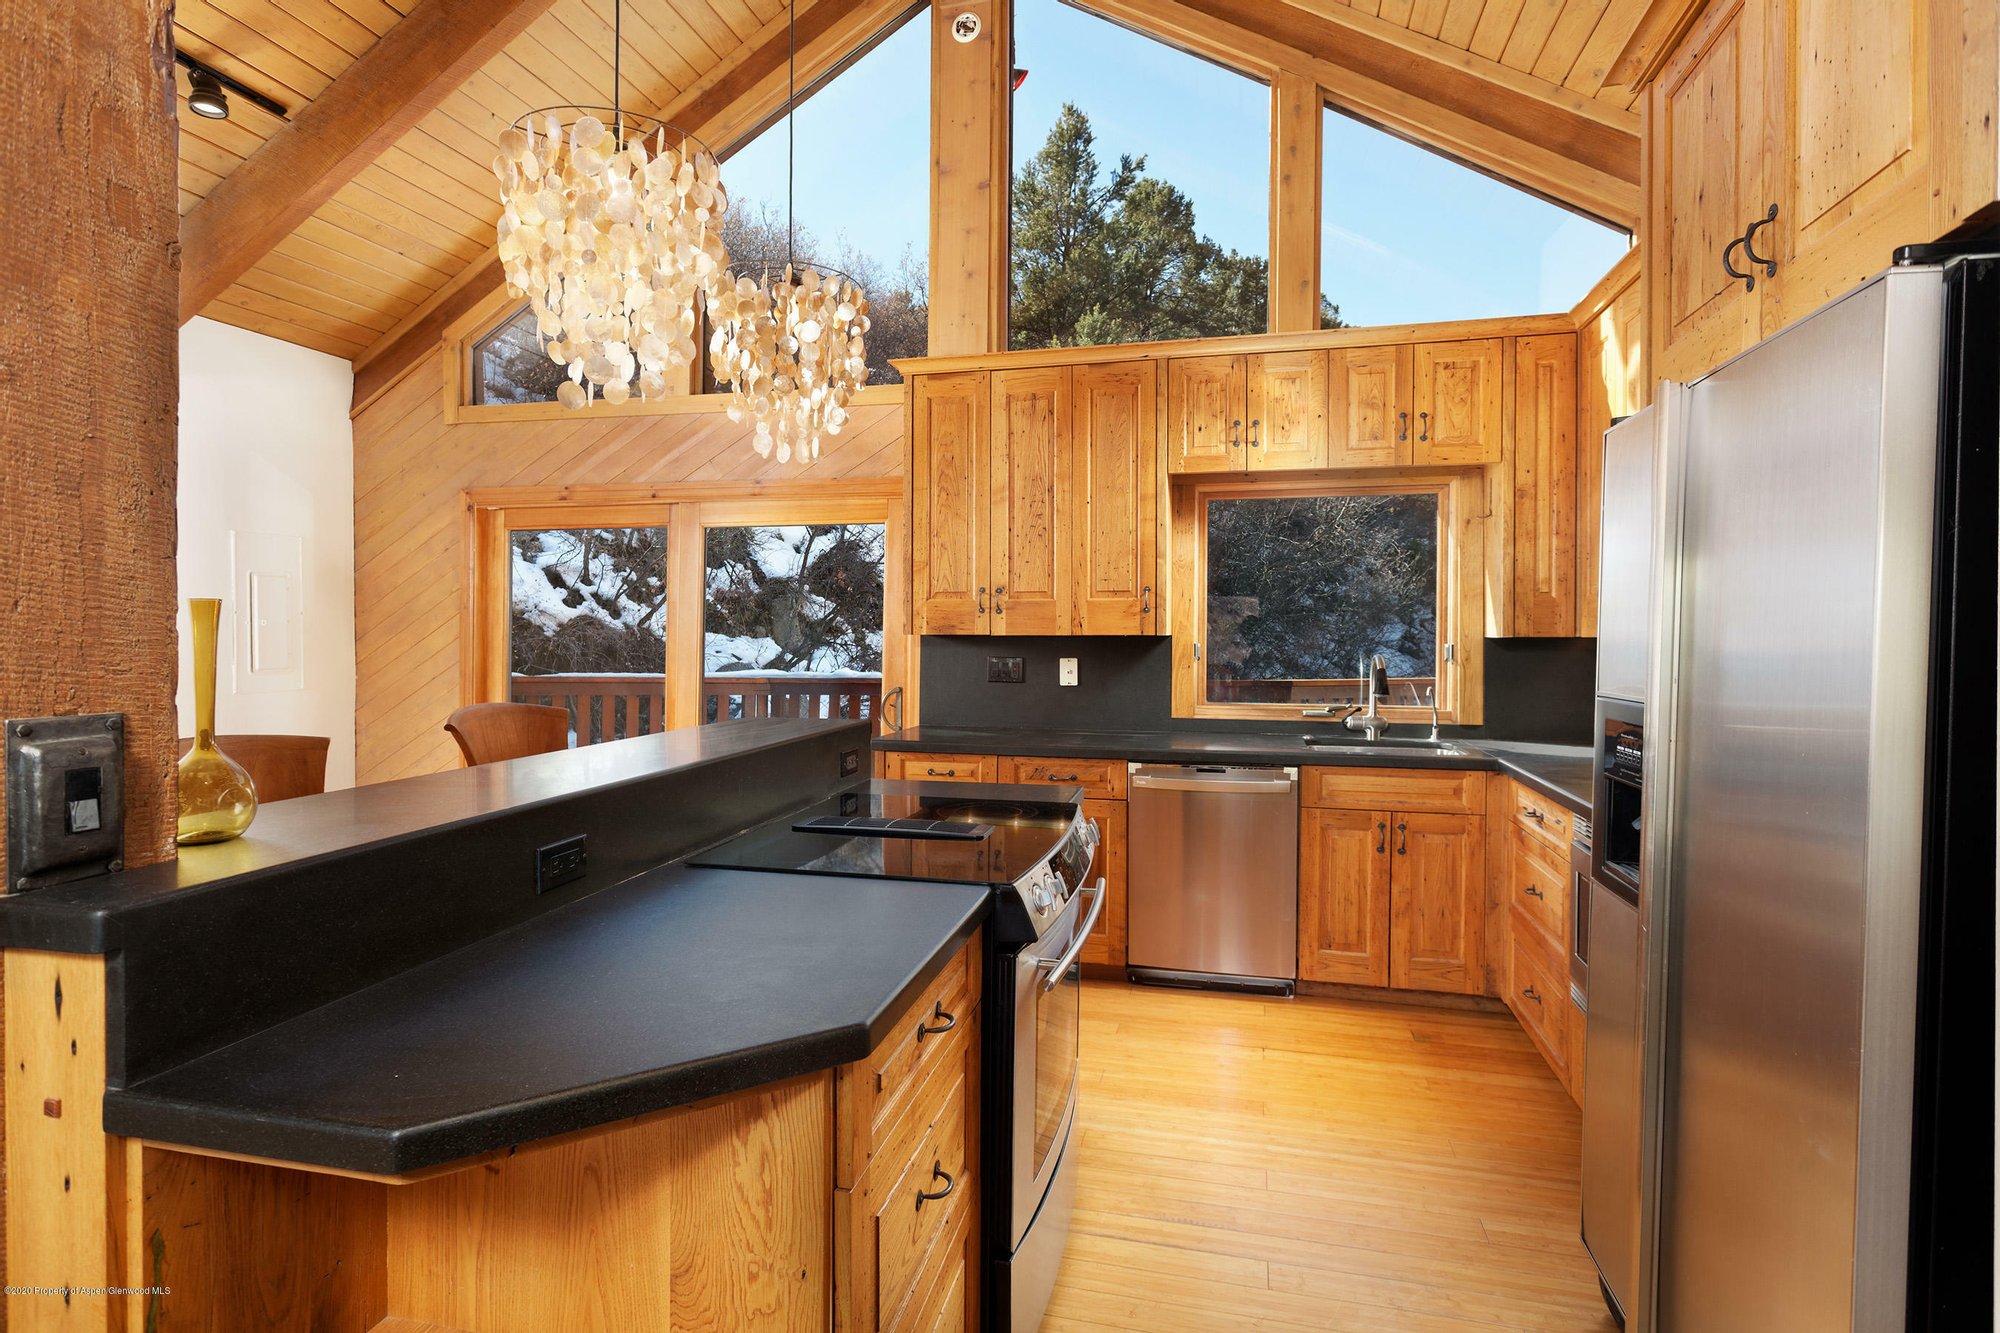 House in El Jebel, Colorado, United States 1